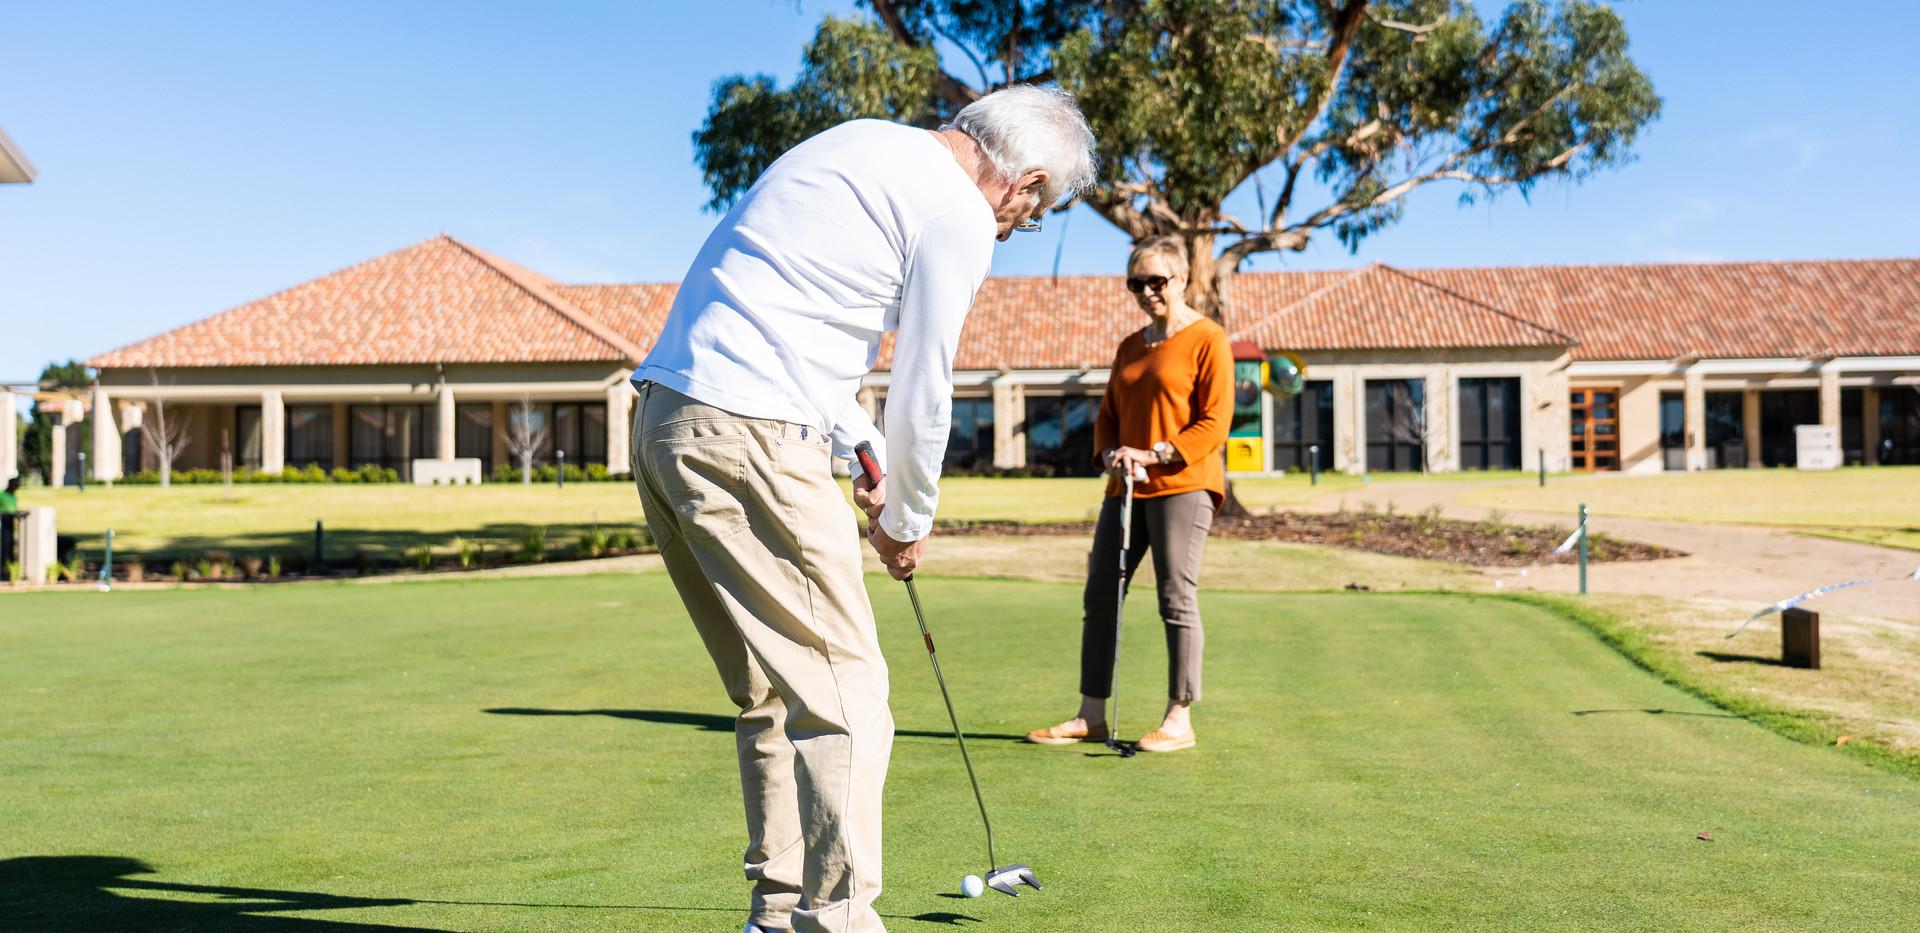 La Dimora Retirement Village residents practising on the putting green at Hidden Valley Resort